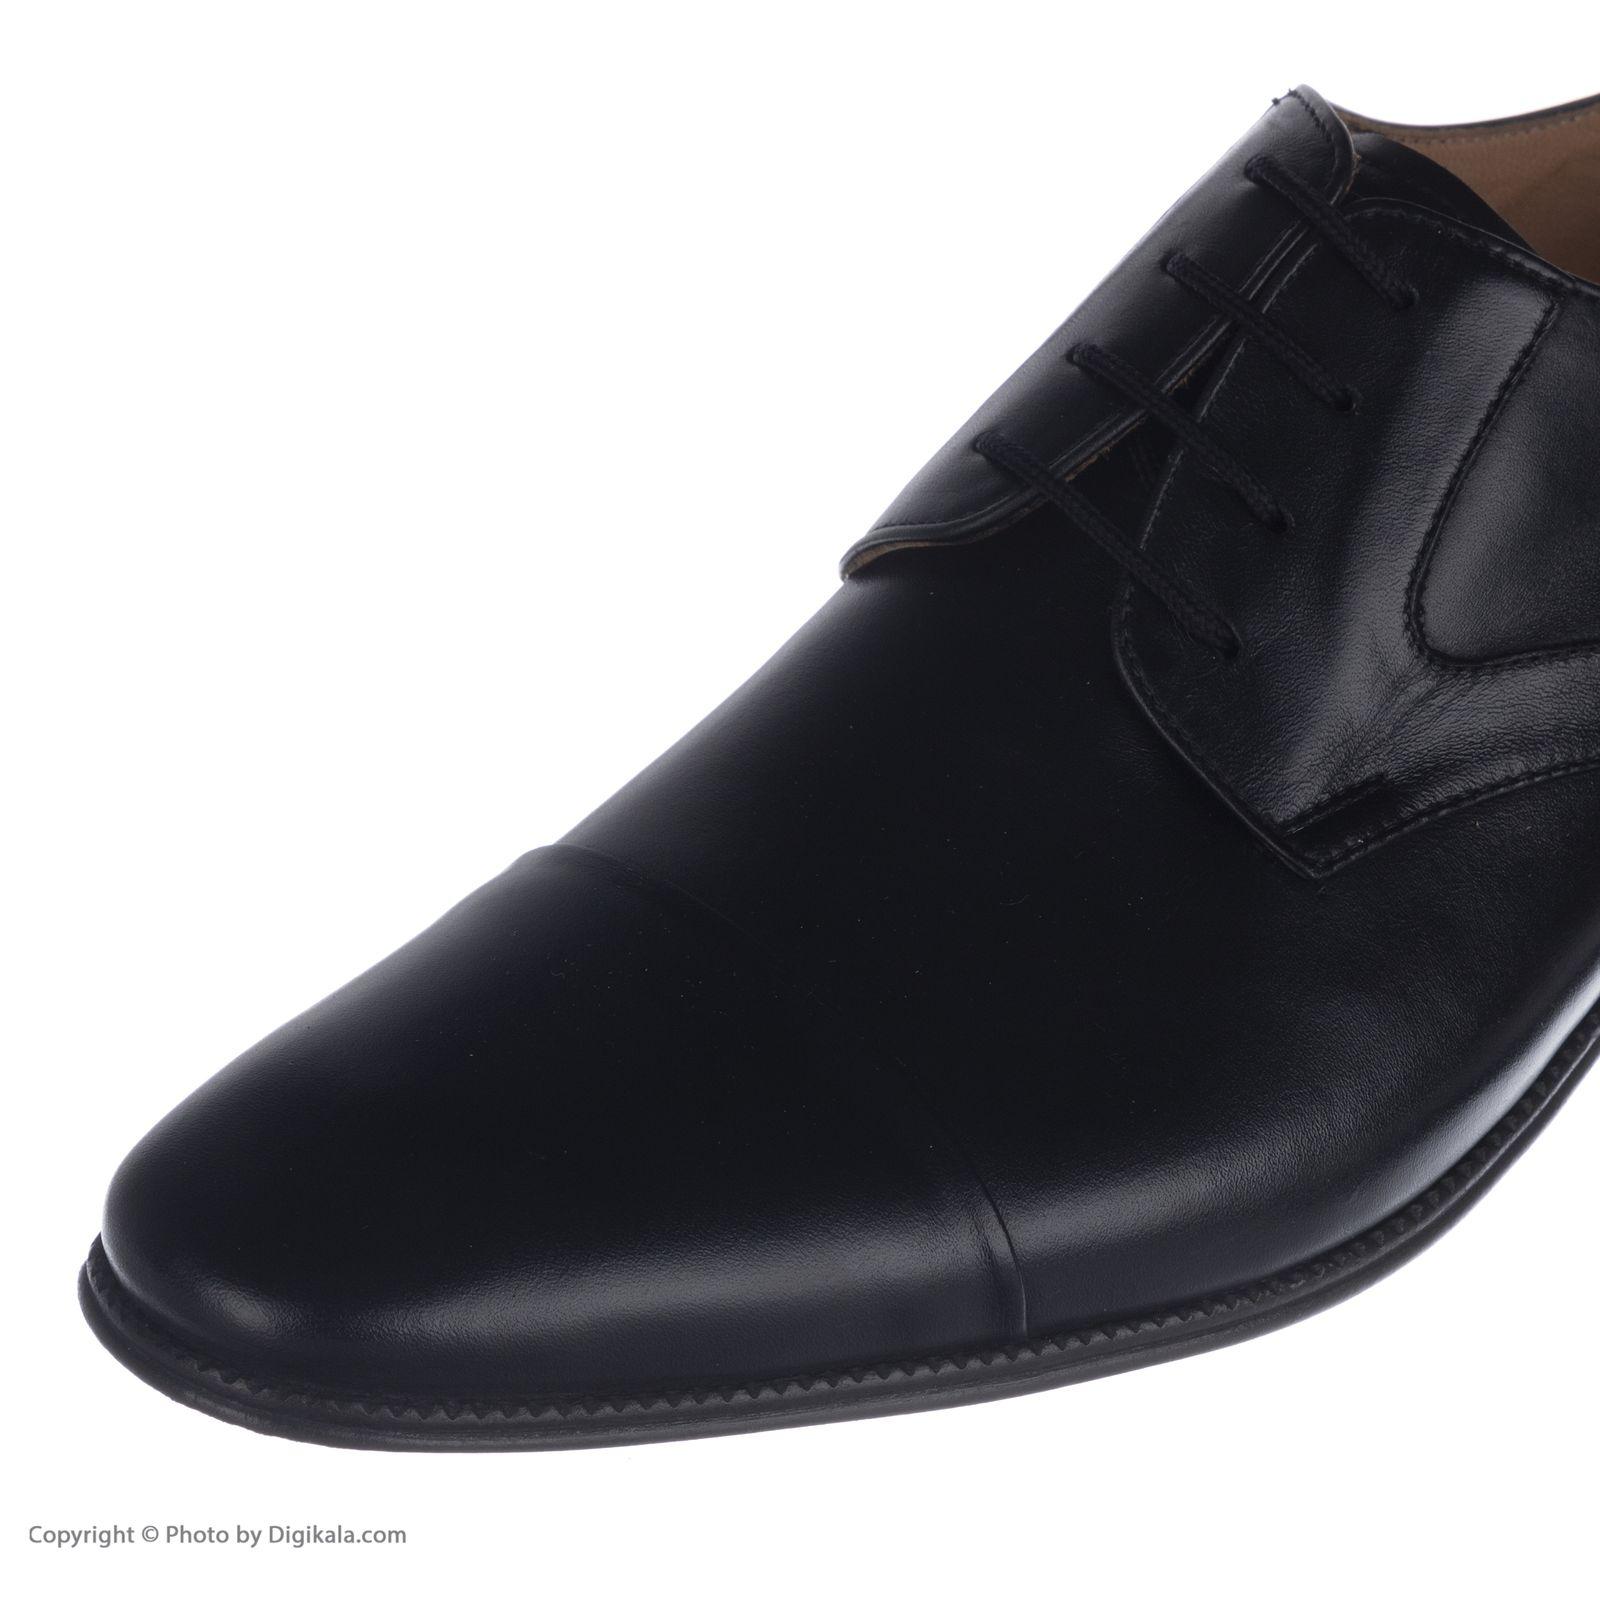 کفش مردانه نظری کد 413 -  - 6